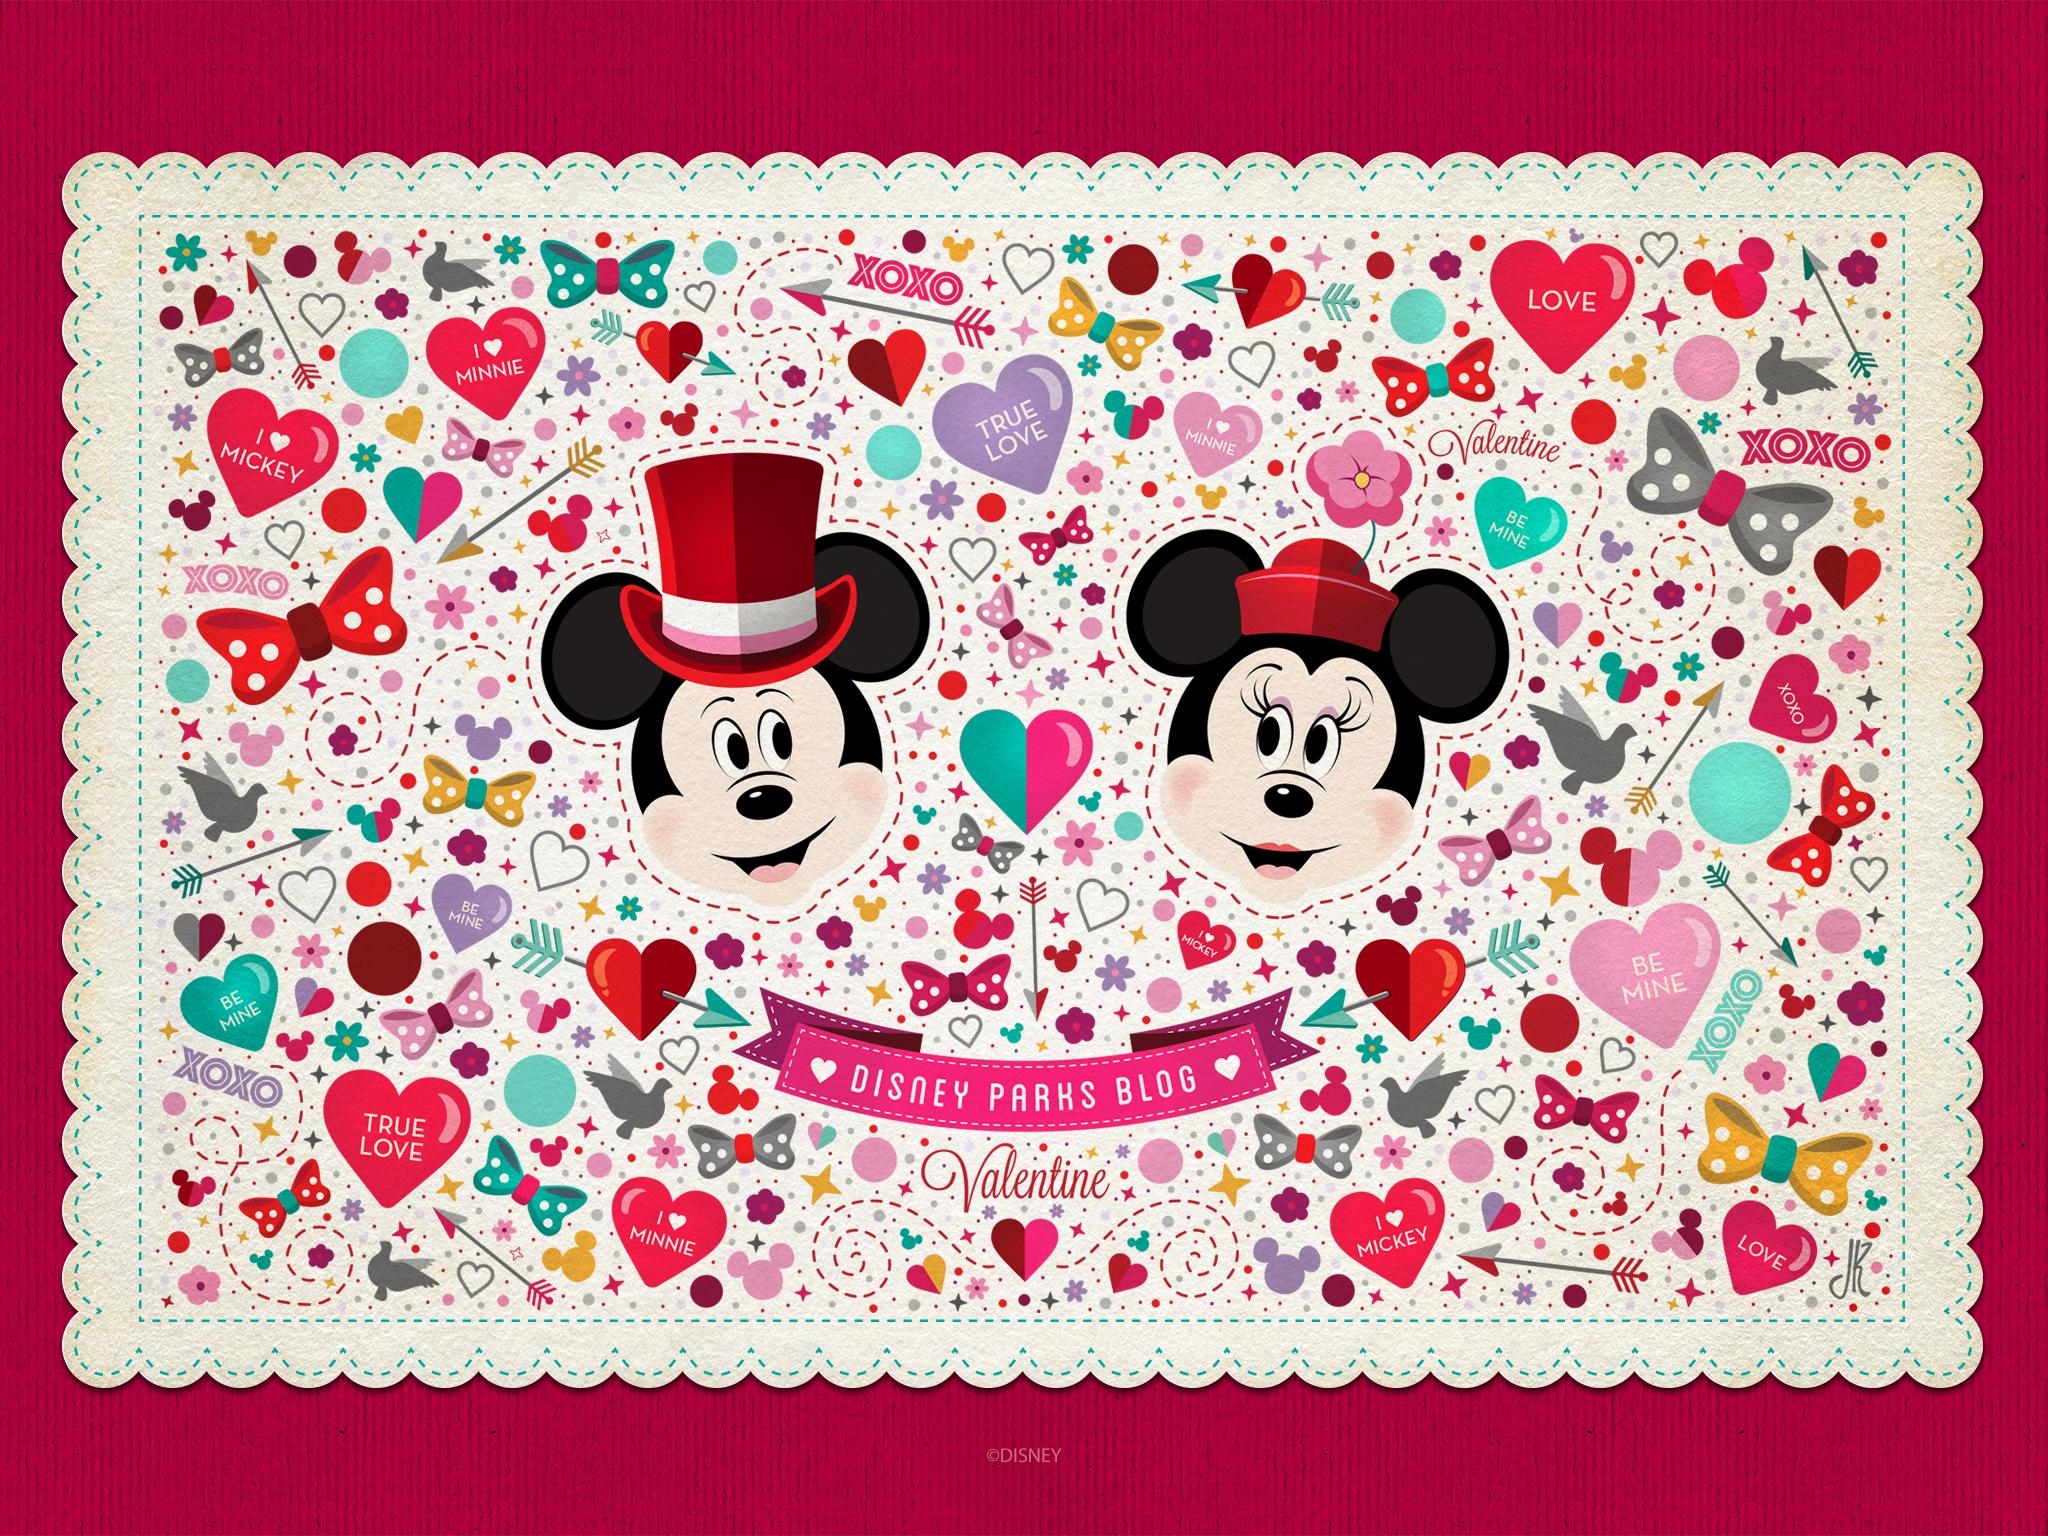 Valentines Day Wallpaper Desktop Disney Parks Blog 2048x1536